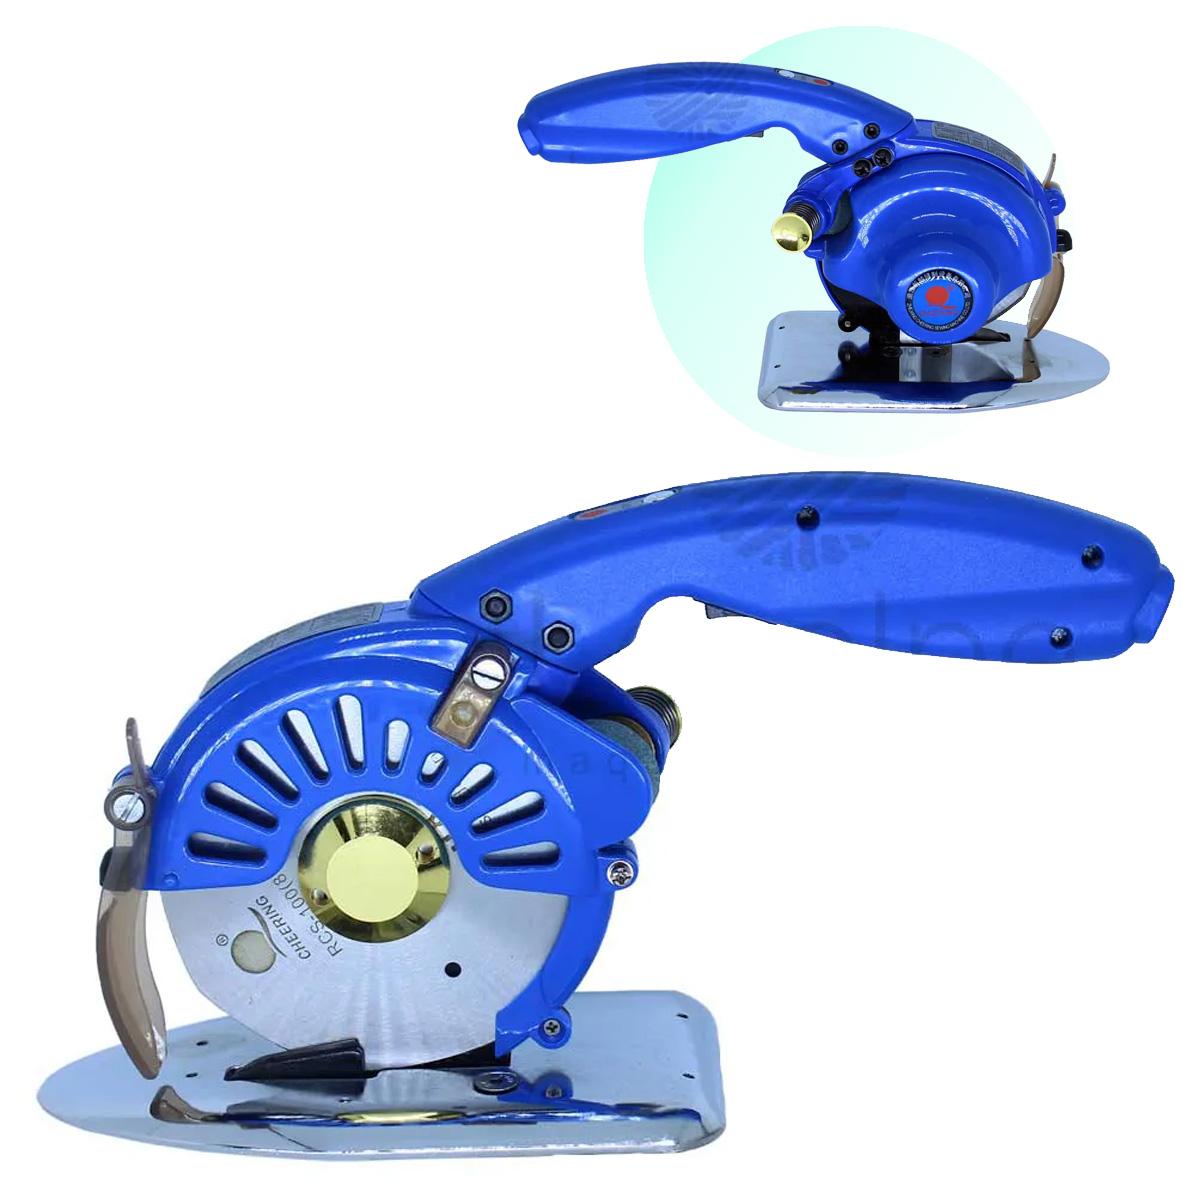 Máquina De Corte 4 Pol Direct Drive 4 Velocidades 200 wats